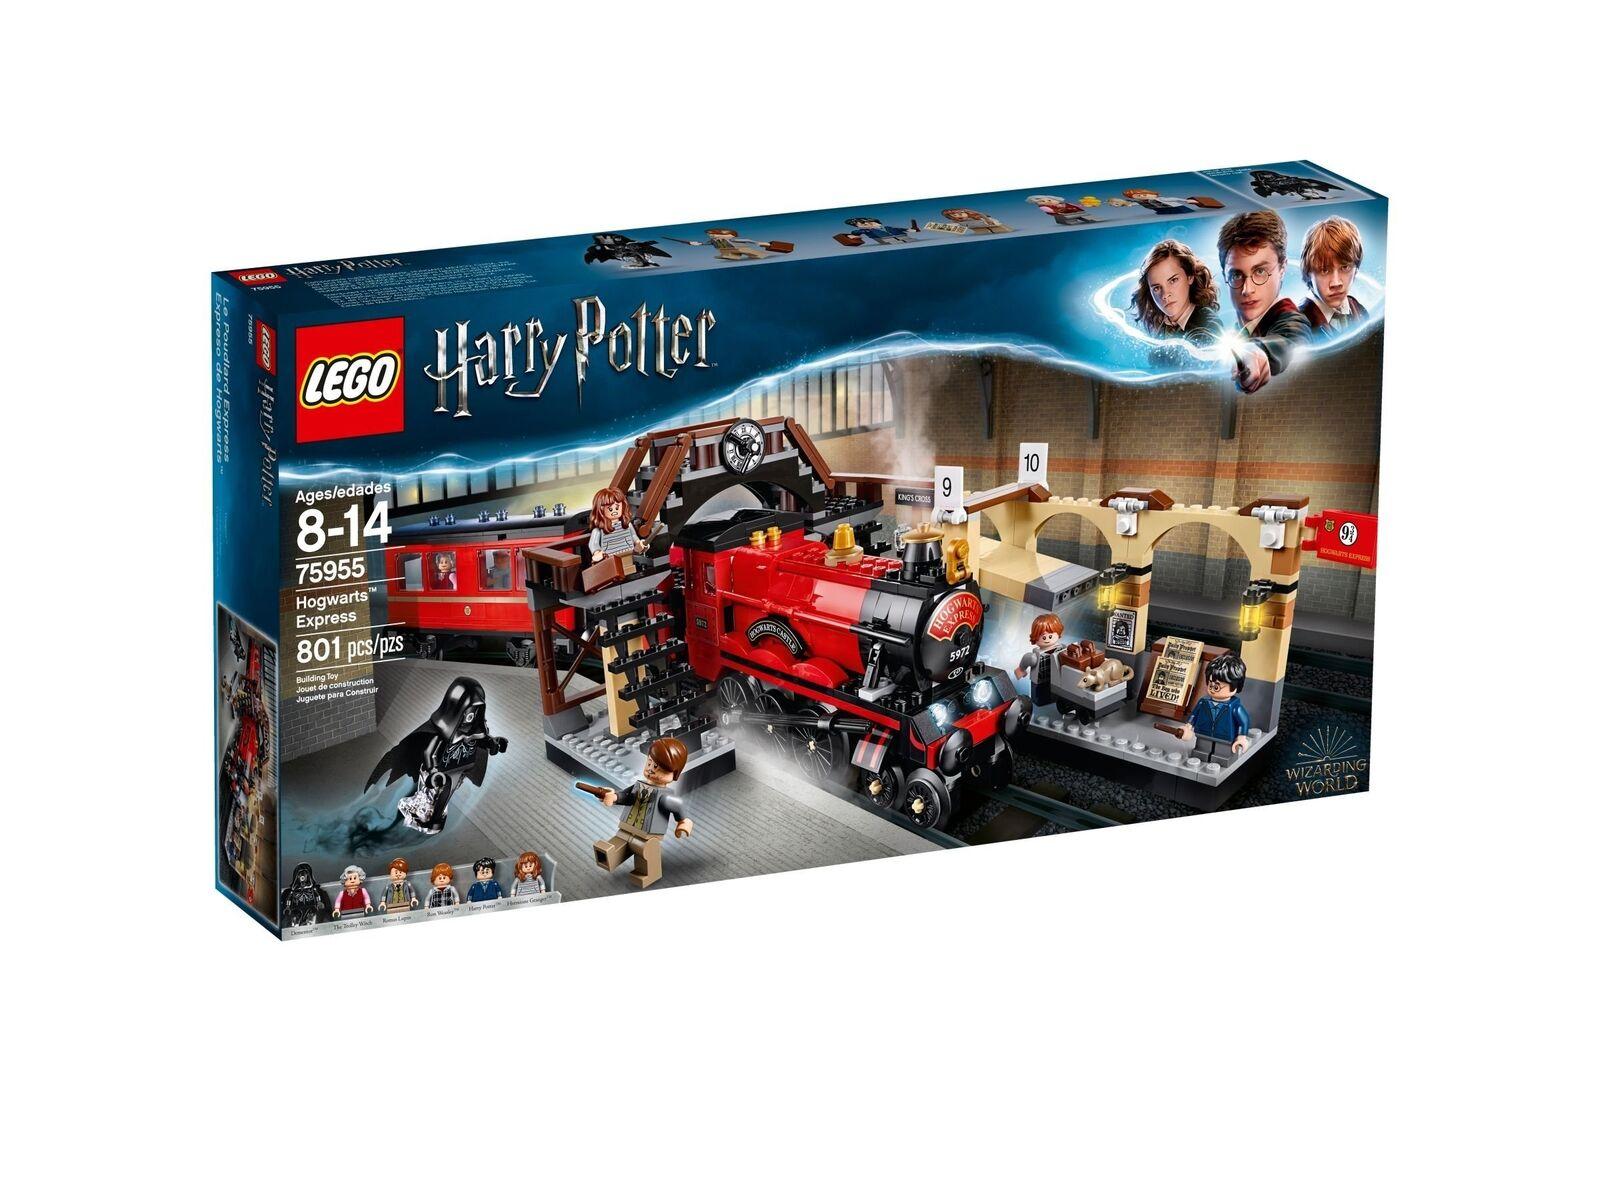 Lego Harry Potter™ 75955 Poudlard™ Express, Neuf Emballage D'Origine D'Origine D'Origine Misb ca0bfc